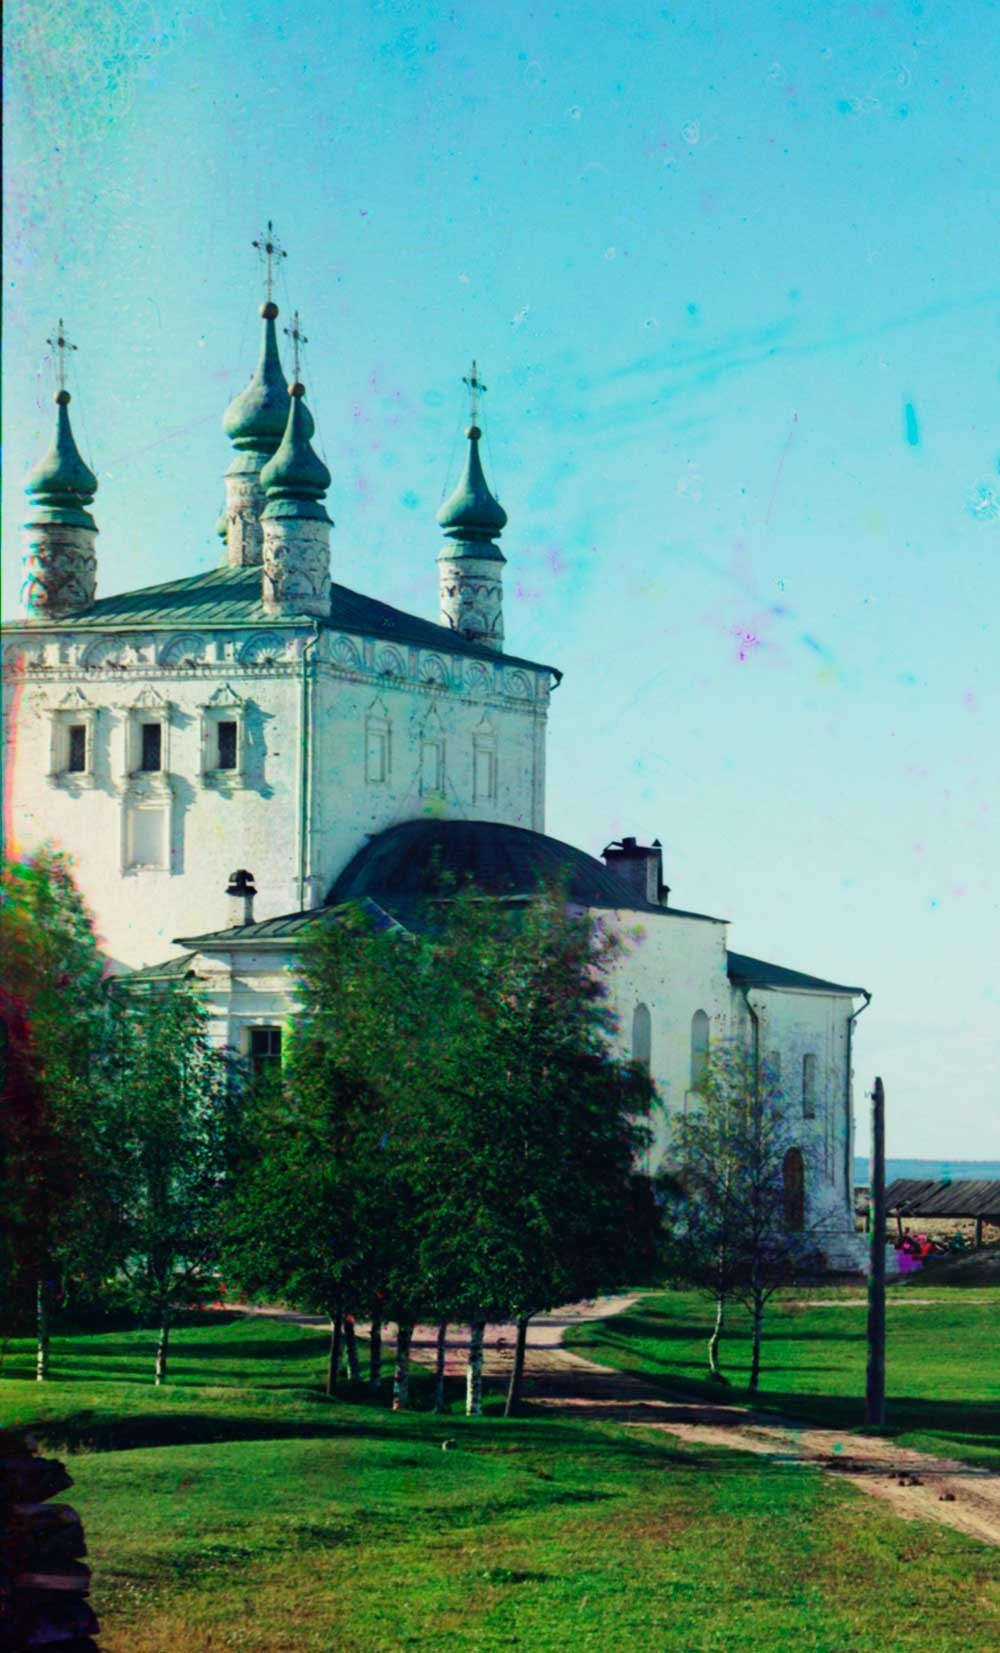 ゴリツキー生神女就寝修道院。全聖人教会。南東側の景観。1911年夏。